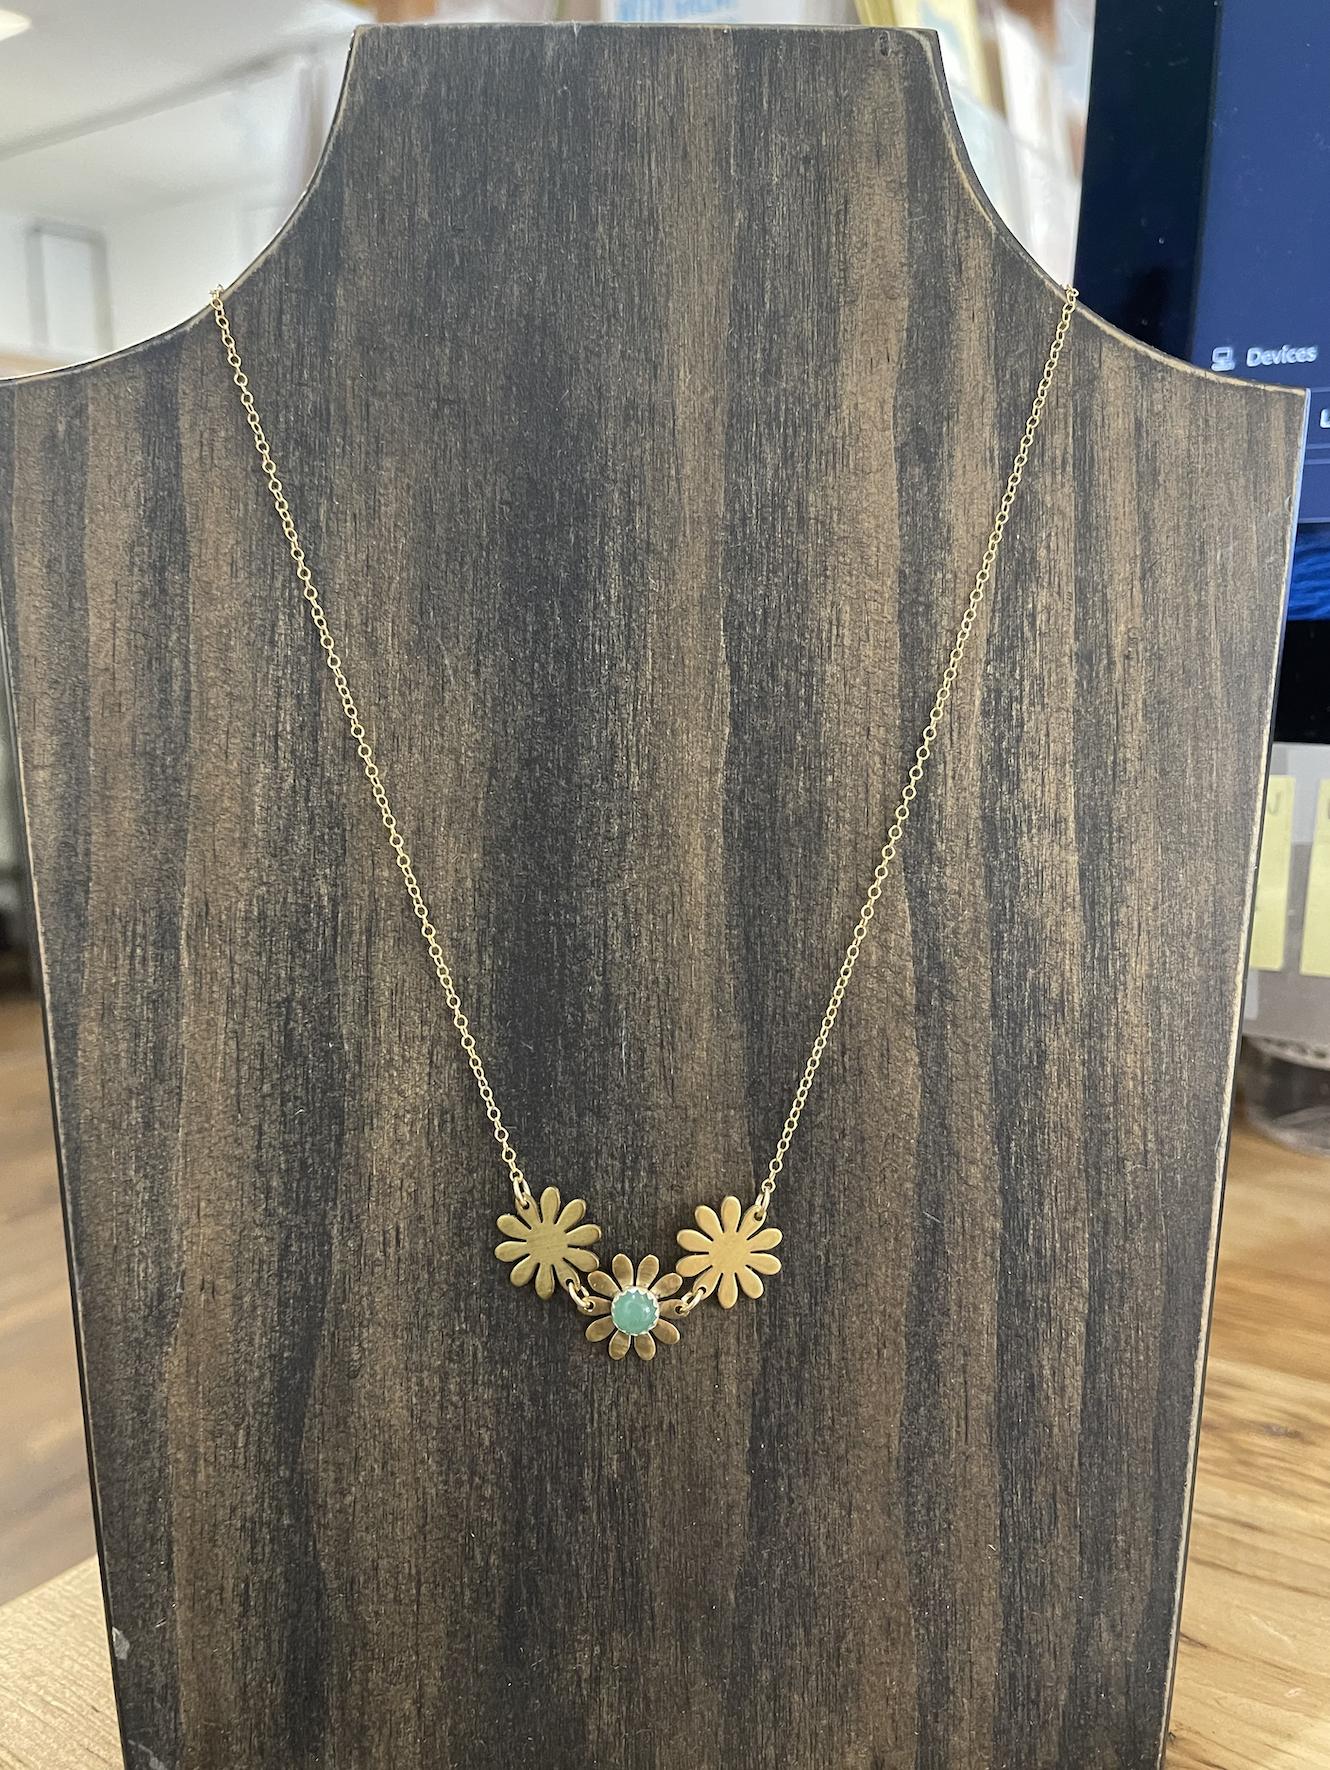 Metrix Jewelry Brigitte Necklace- Green Aventurine